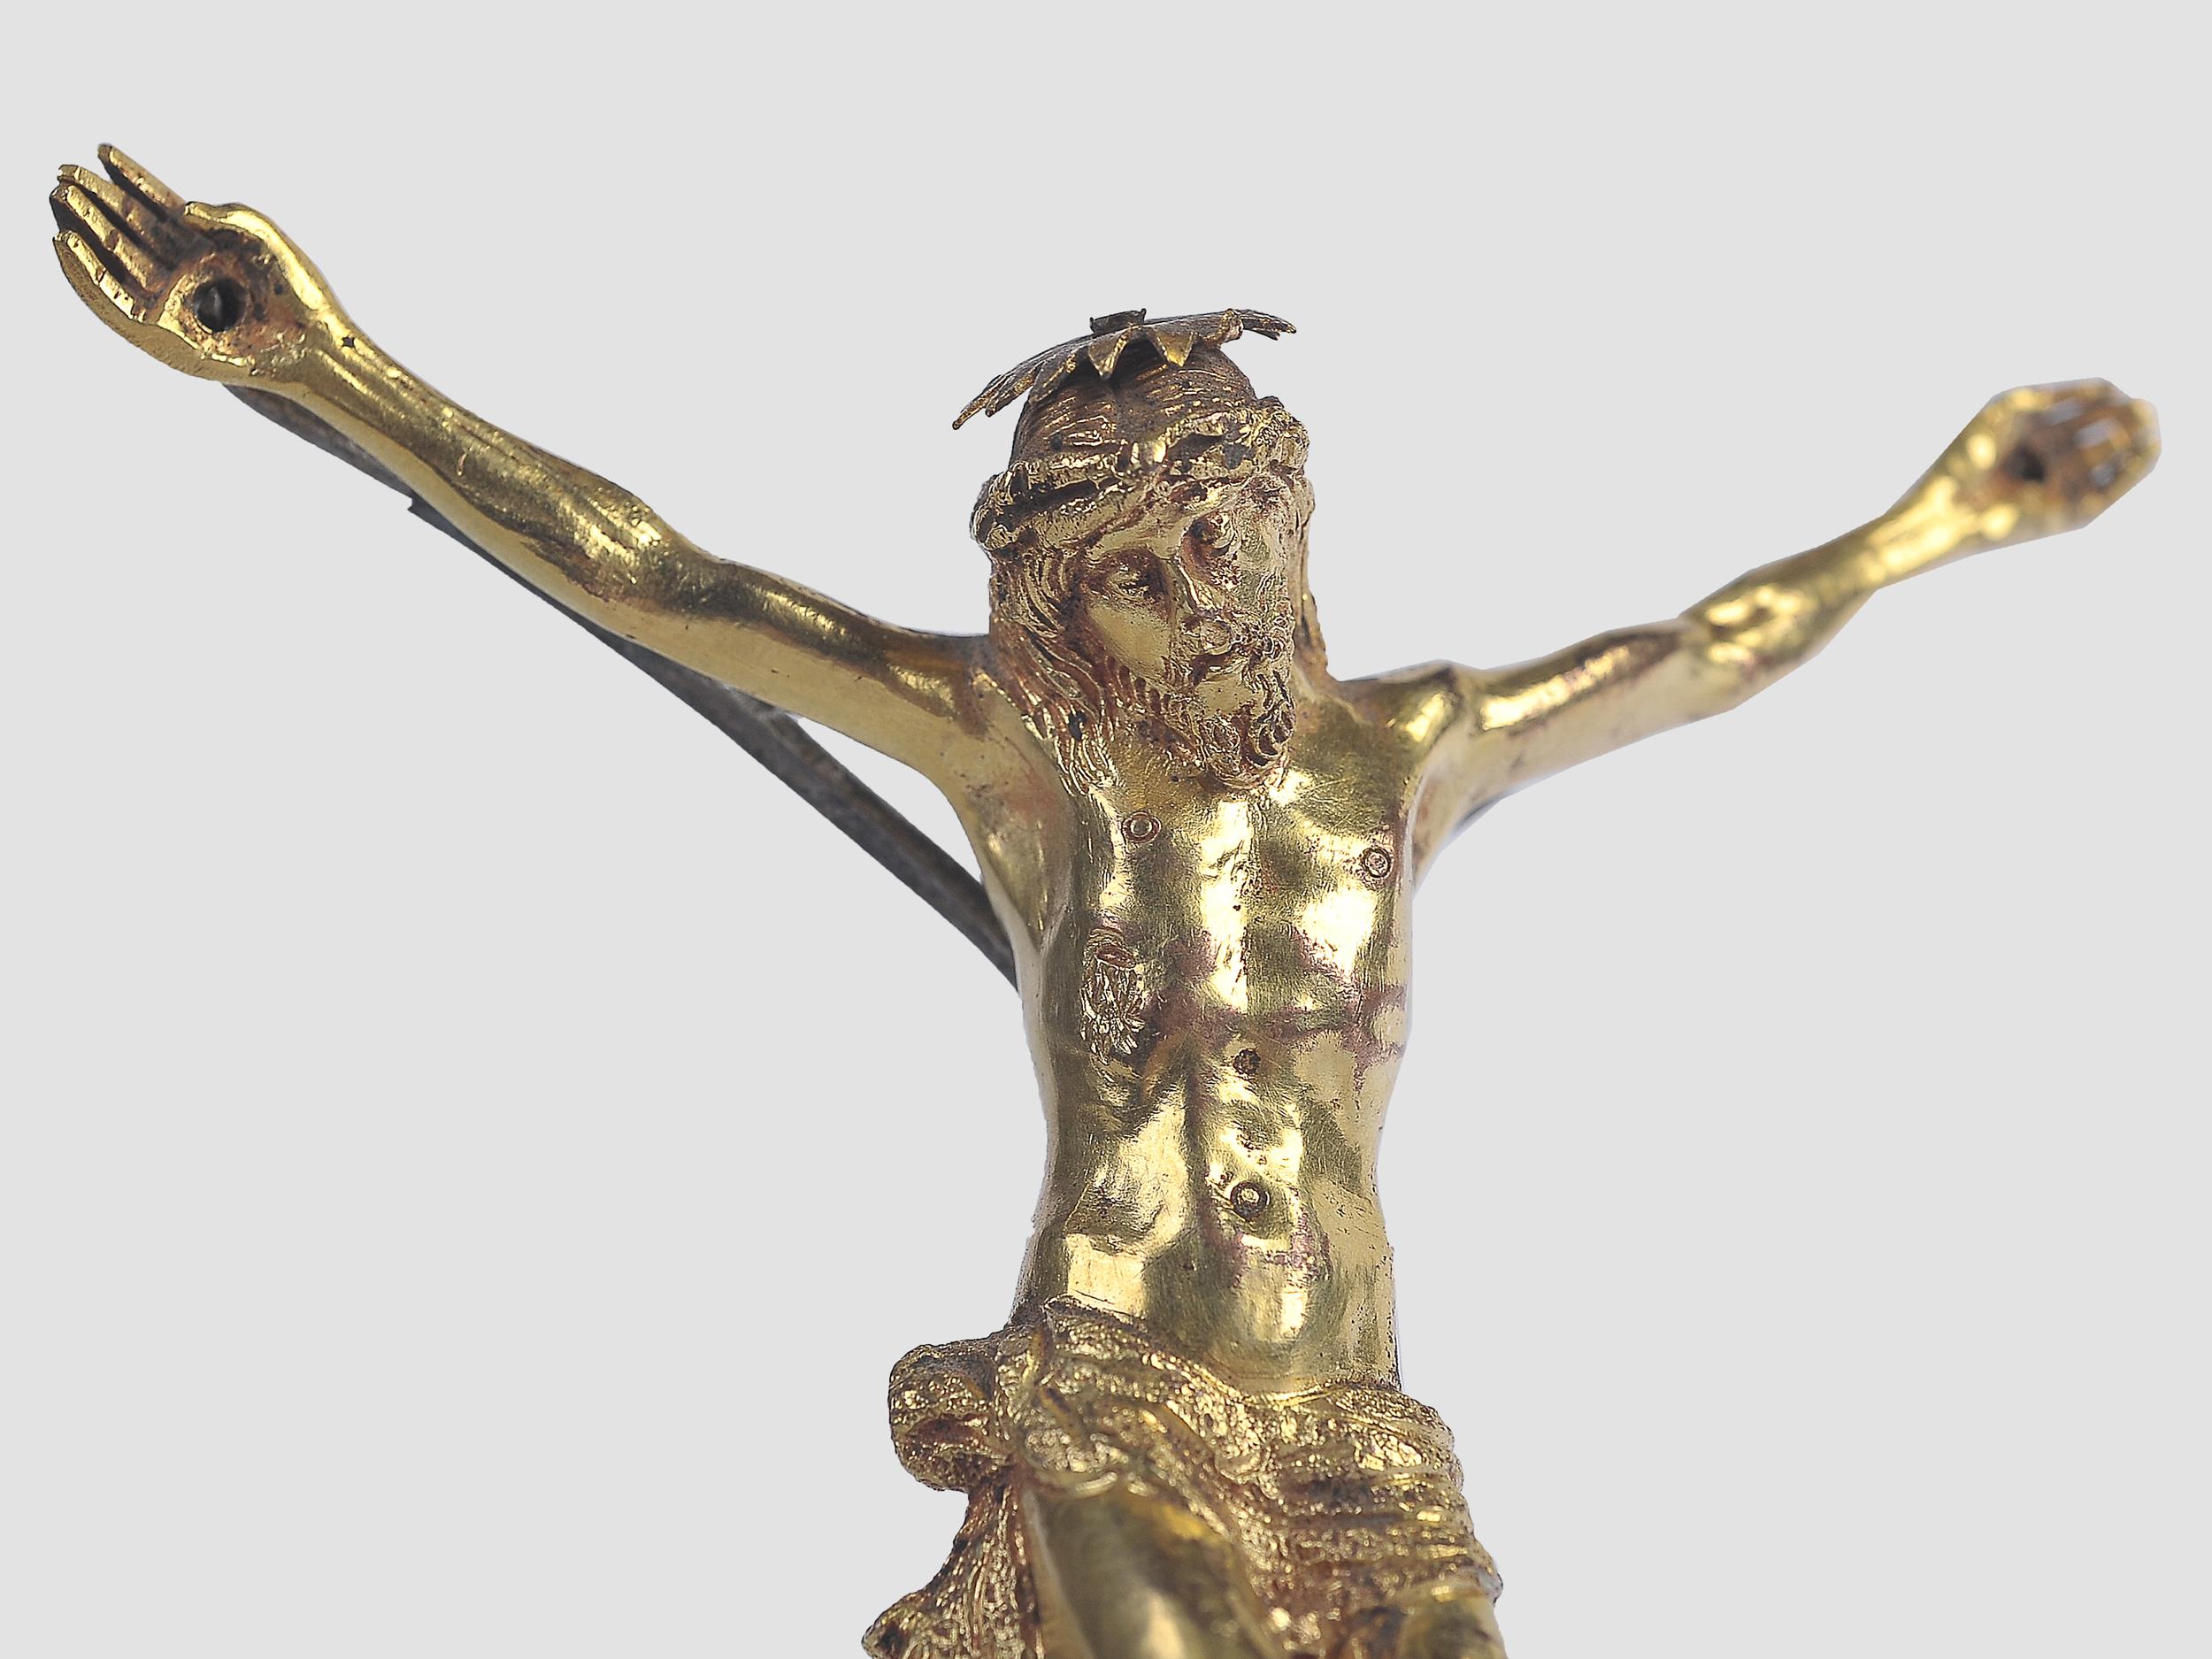 Corpus Christi, Süddeutsch oder Italien, 17. Jahrhundert, Bronze - Image 4 of 5